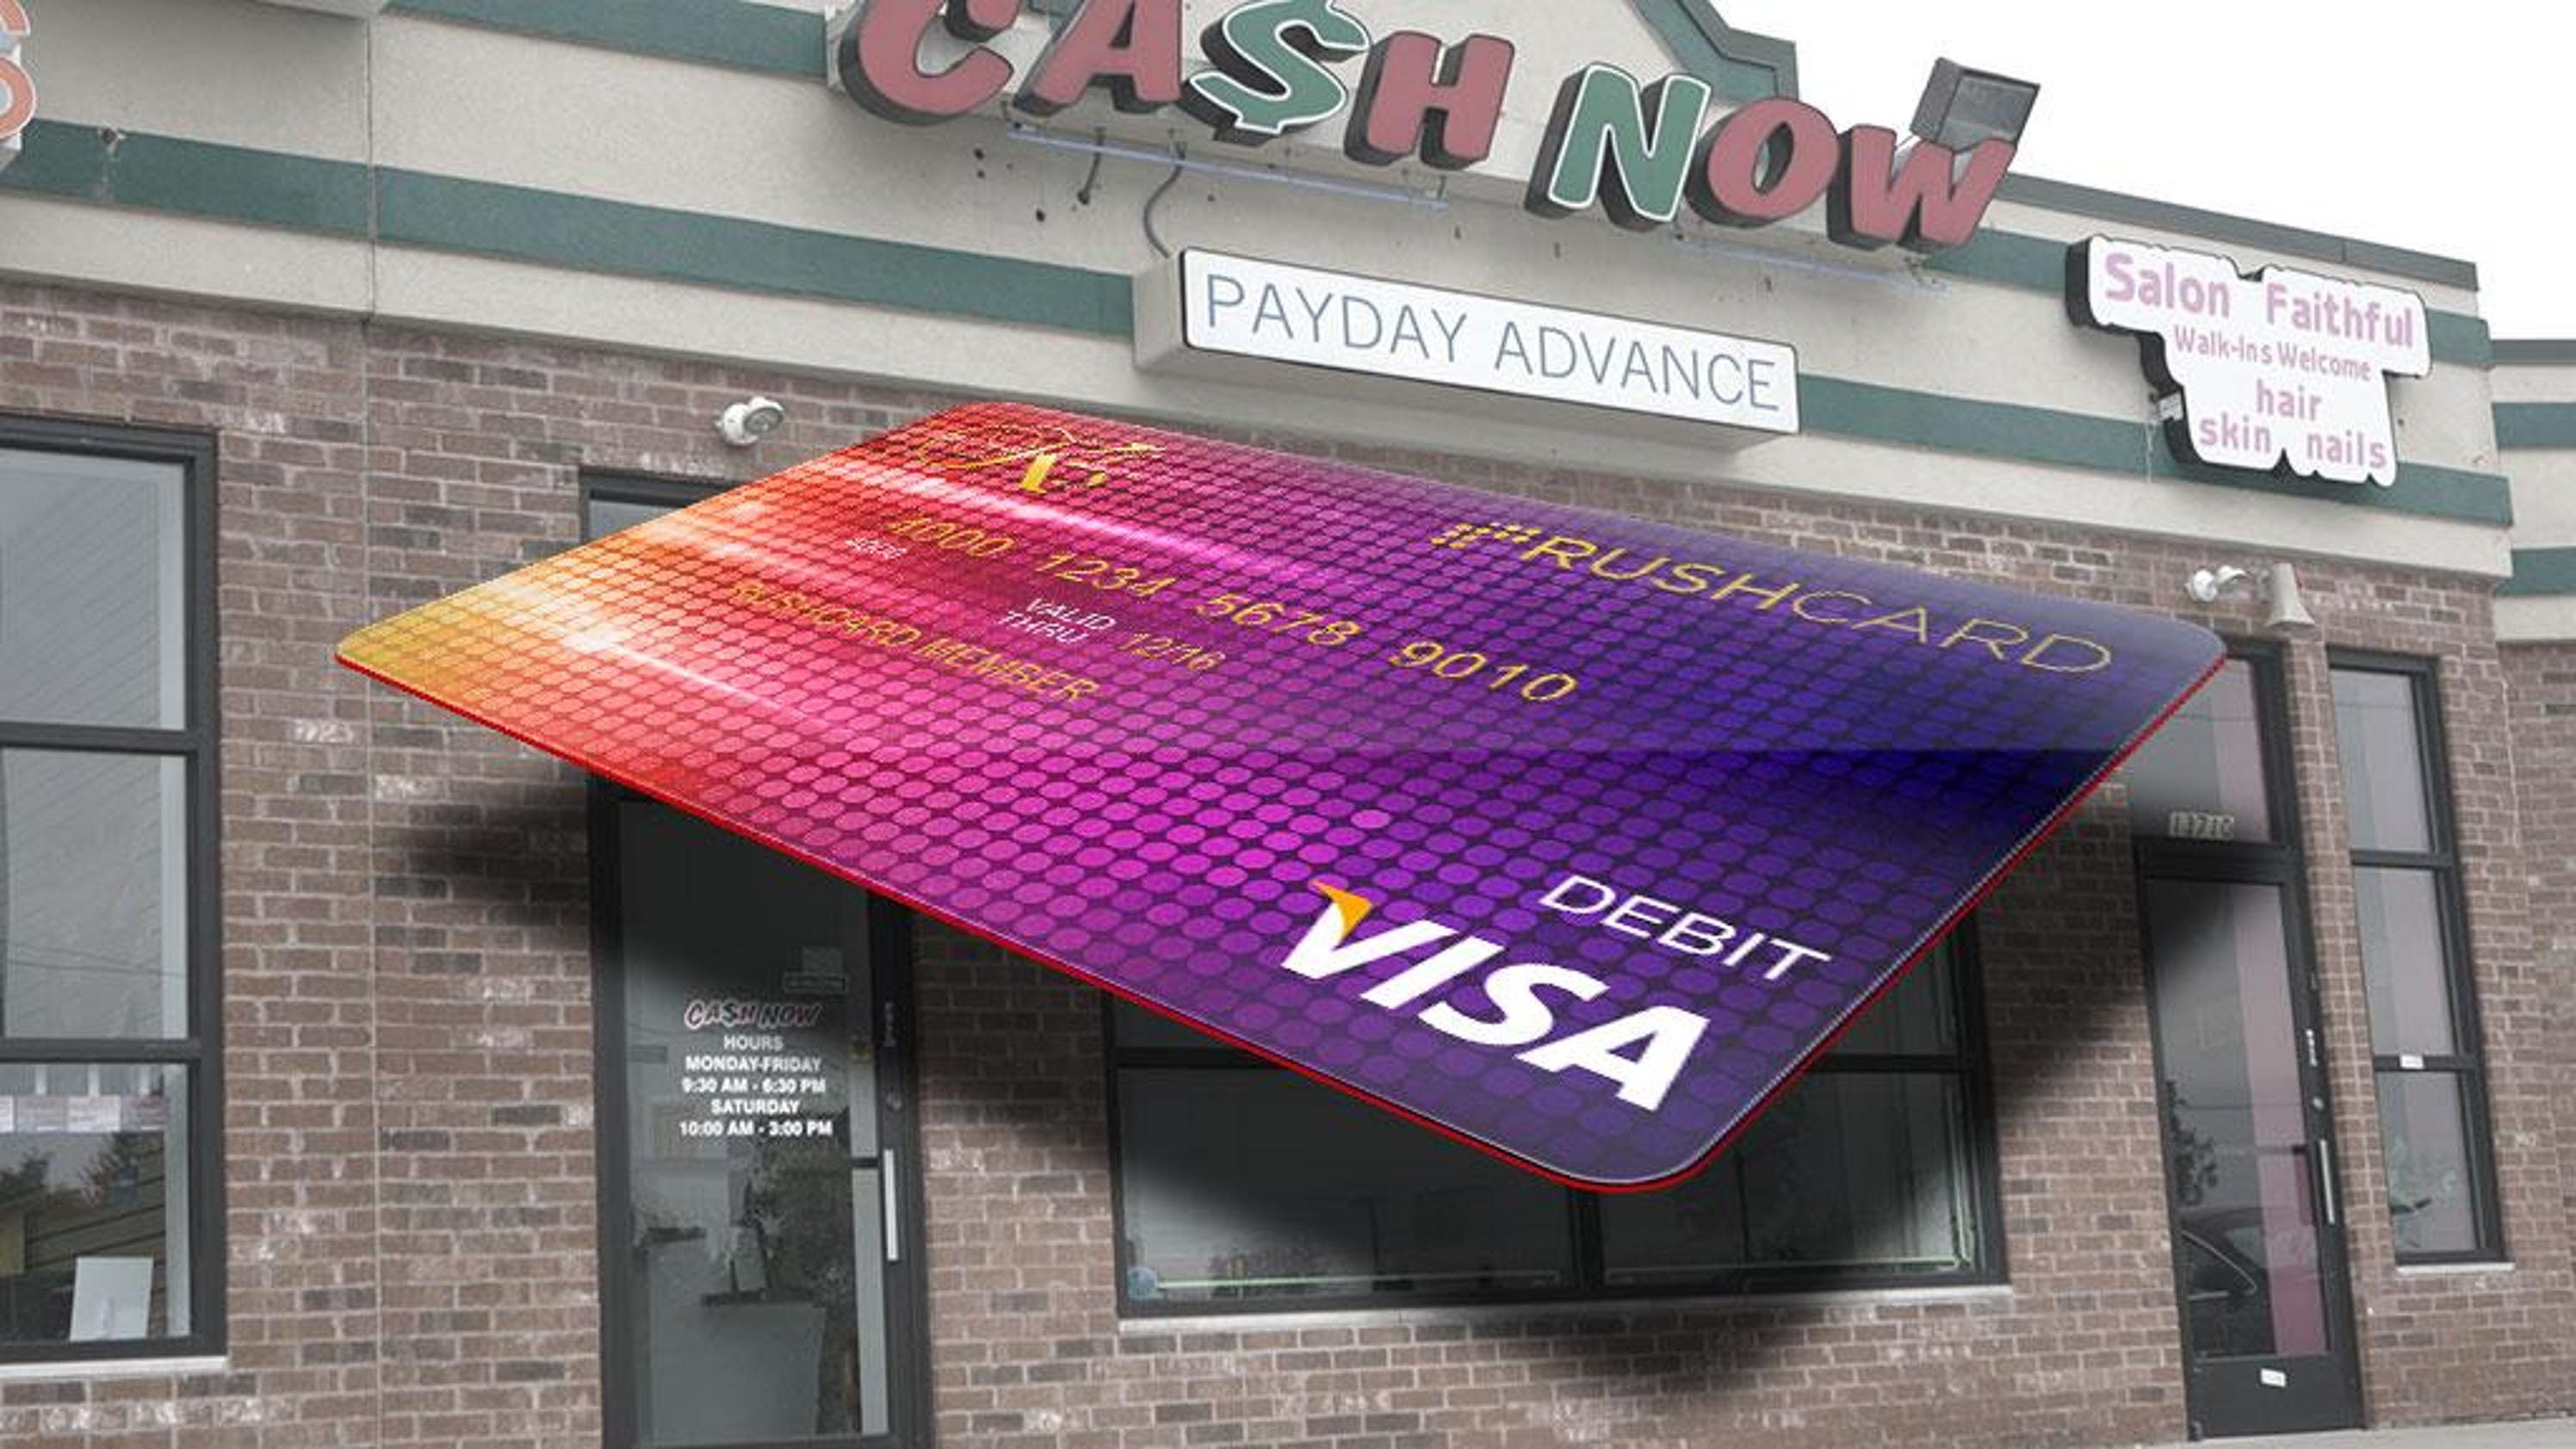 Cash advance america logo photo 6